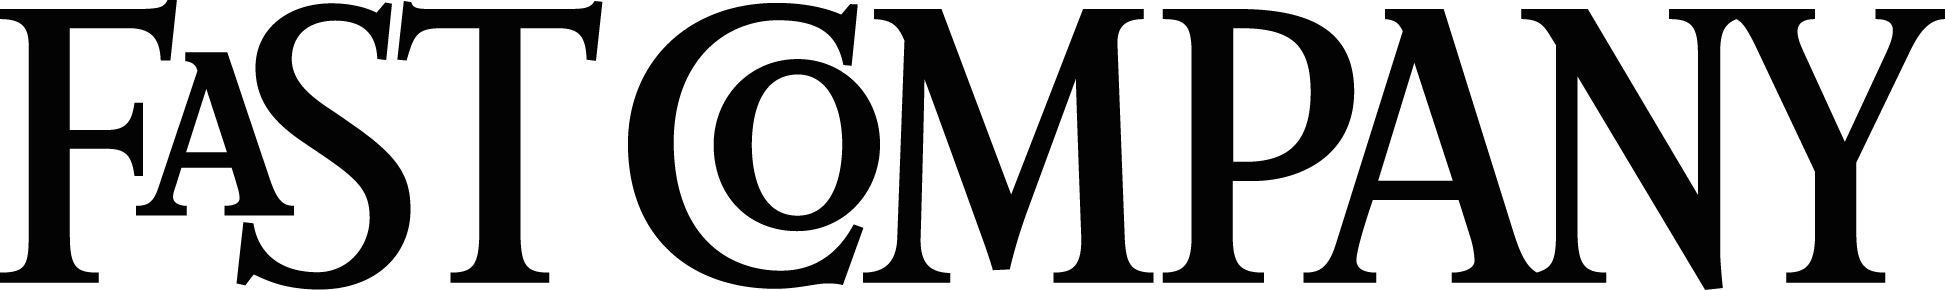 Fast Company Logo png